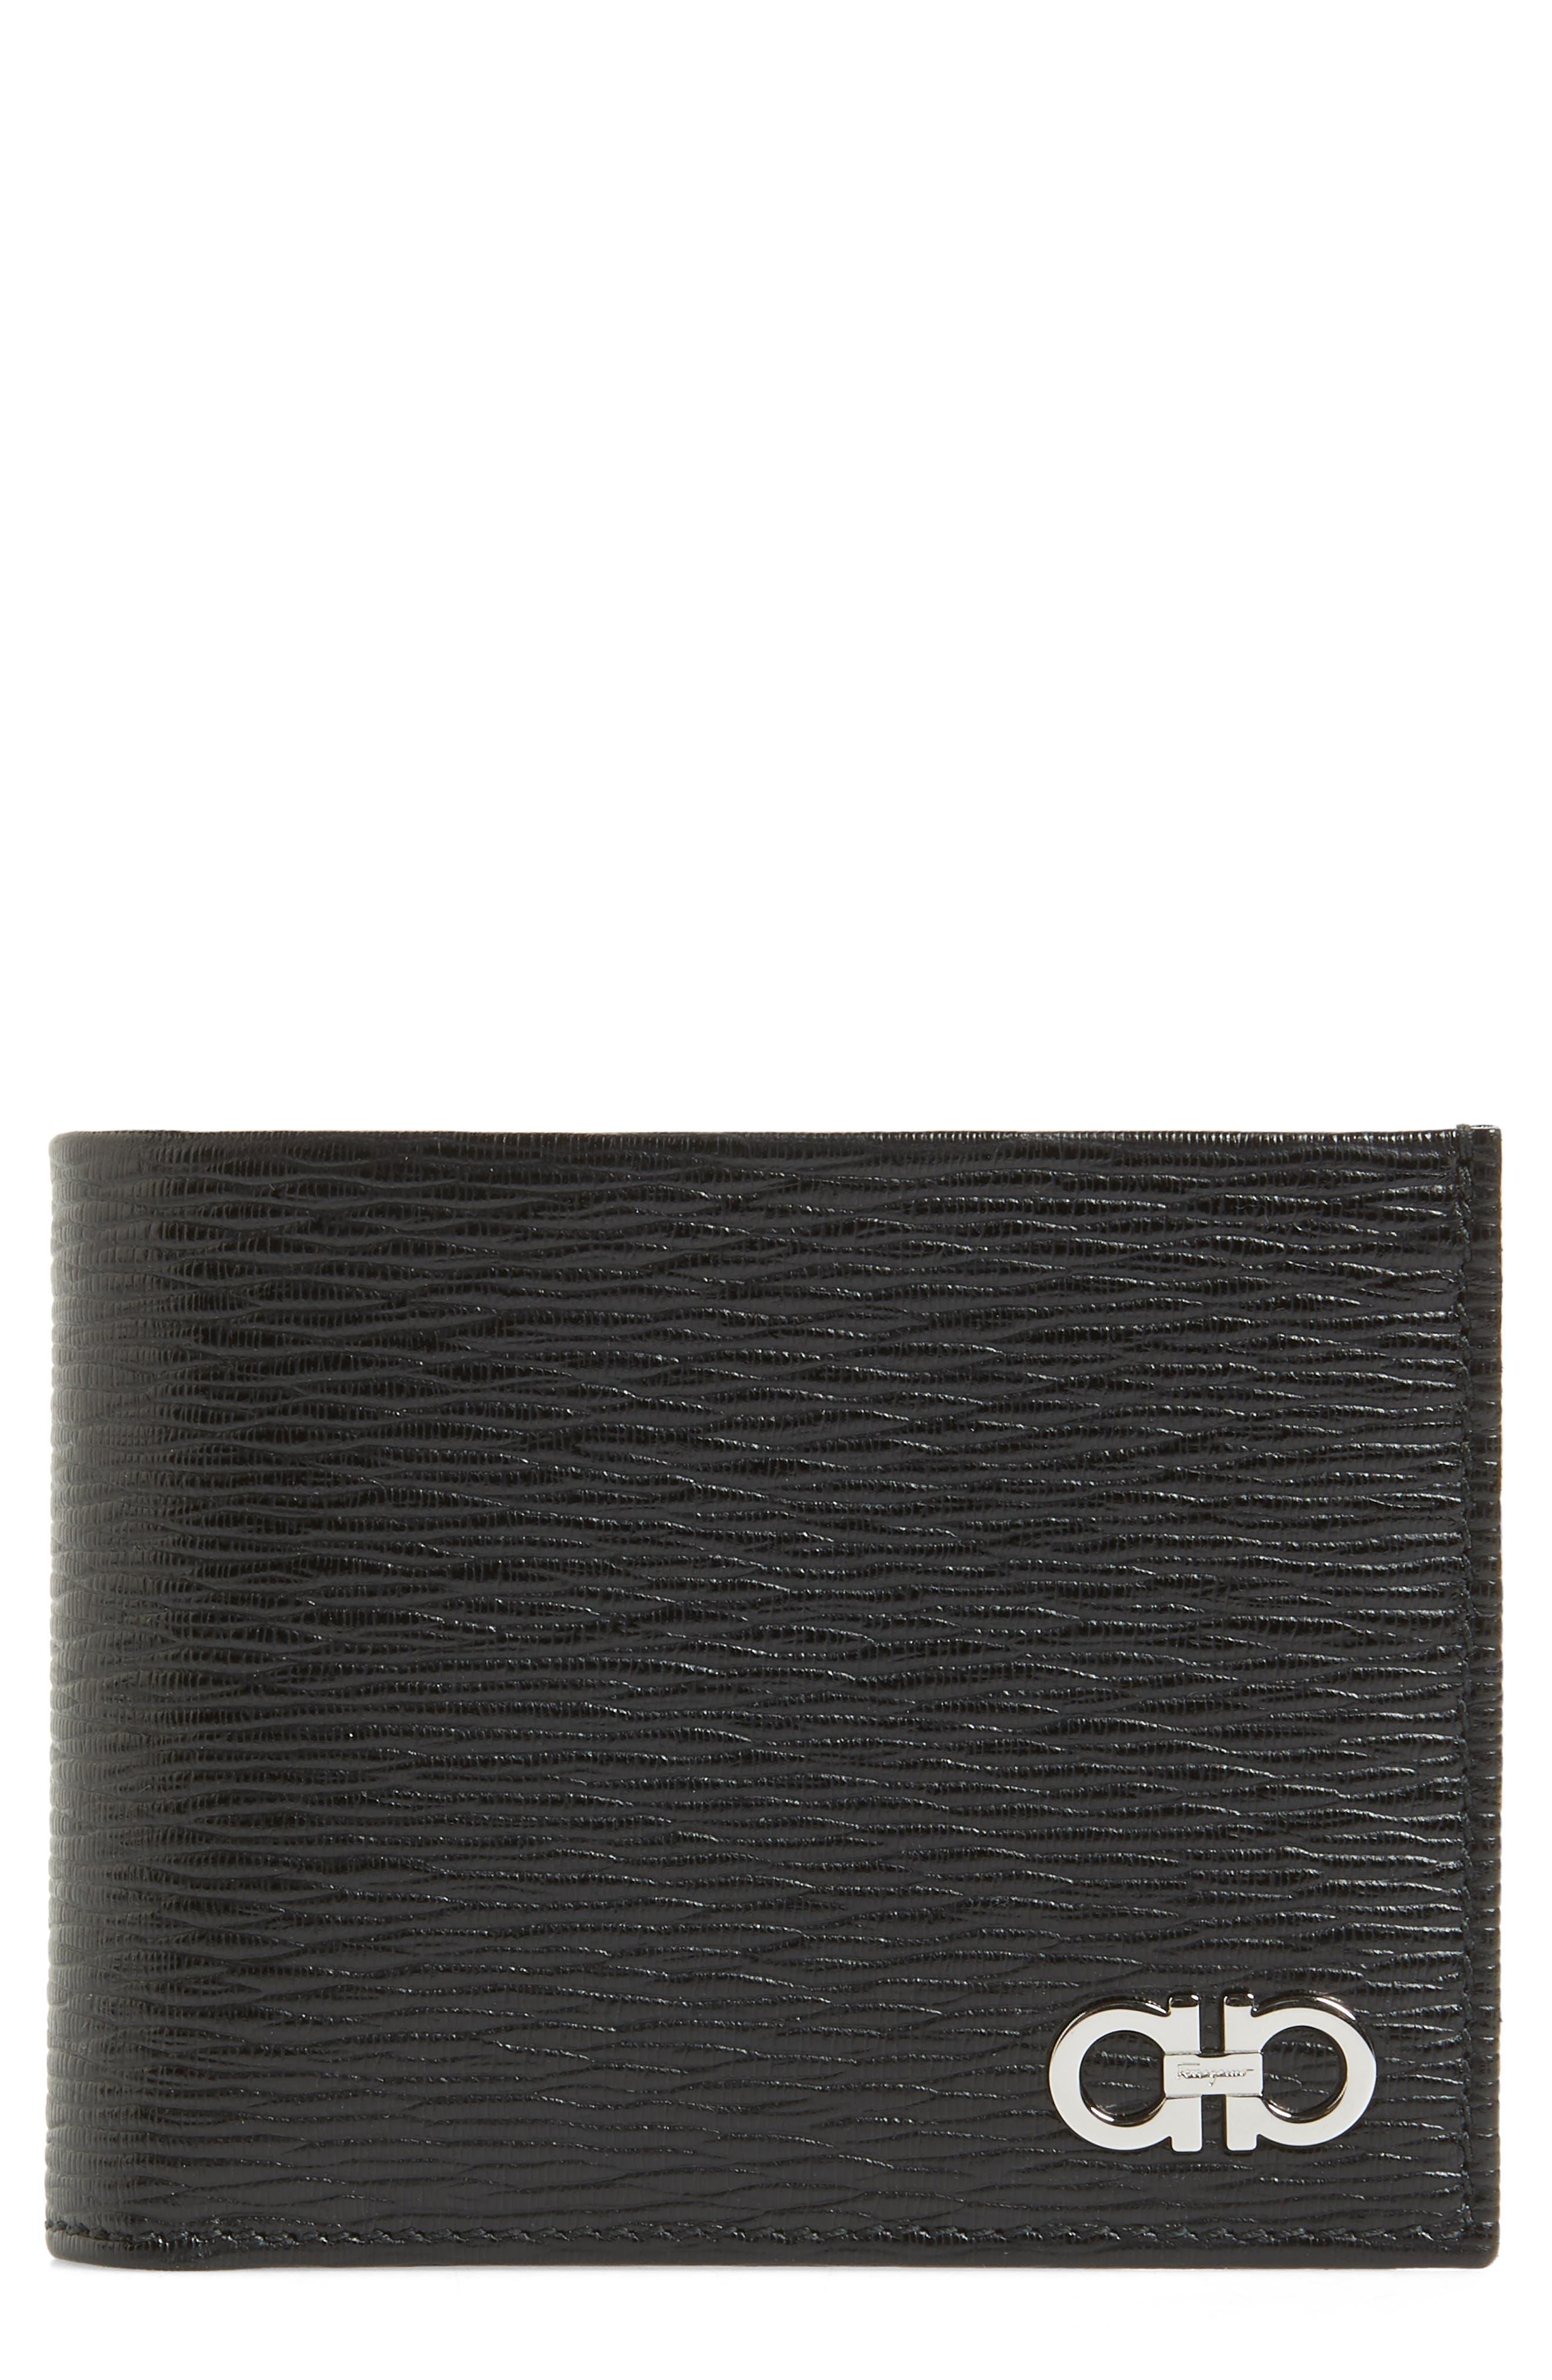 Revival Leather Card Case,                             Main thumbnail 1, color,                             019